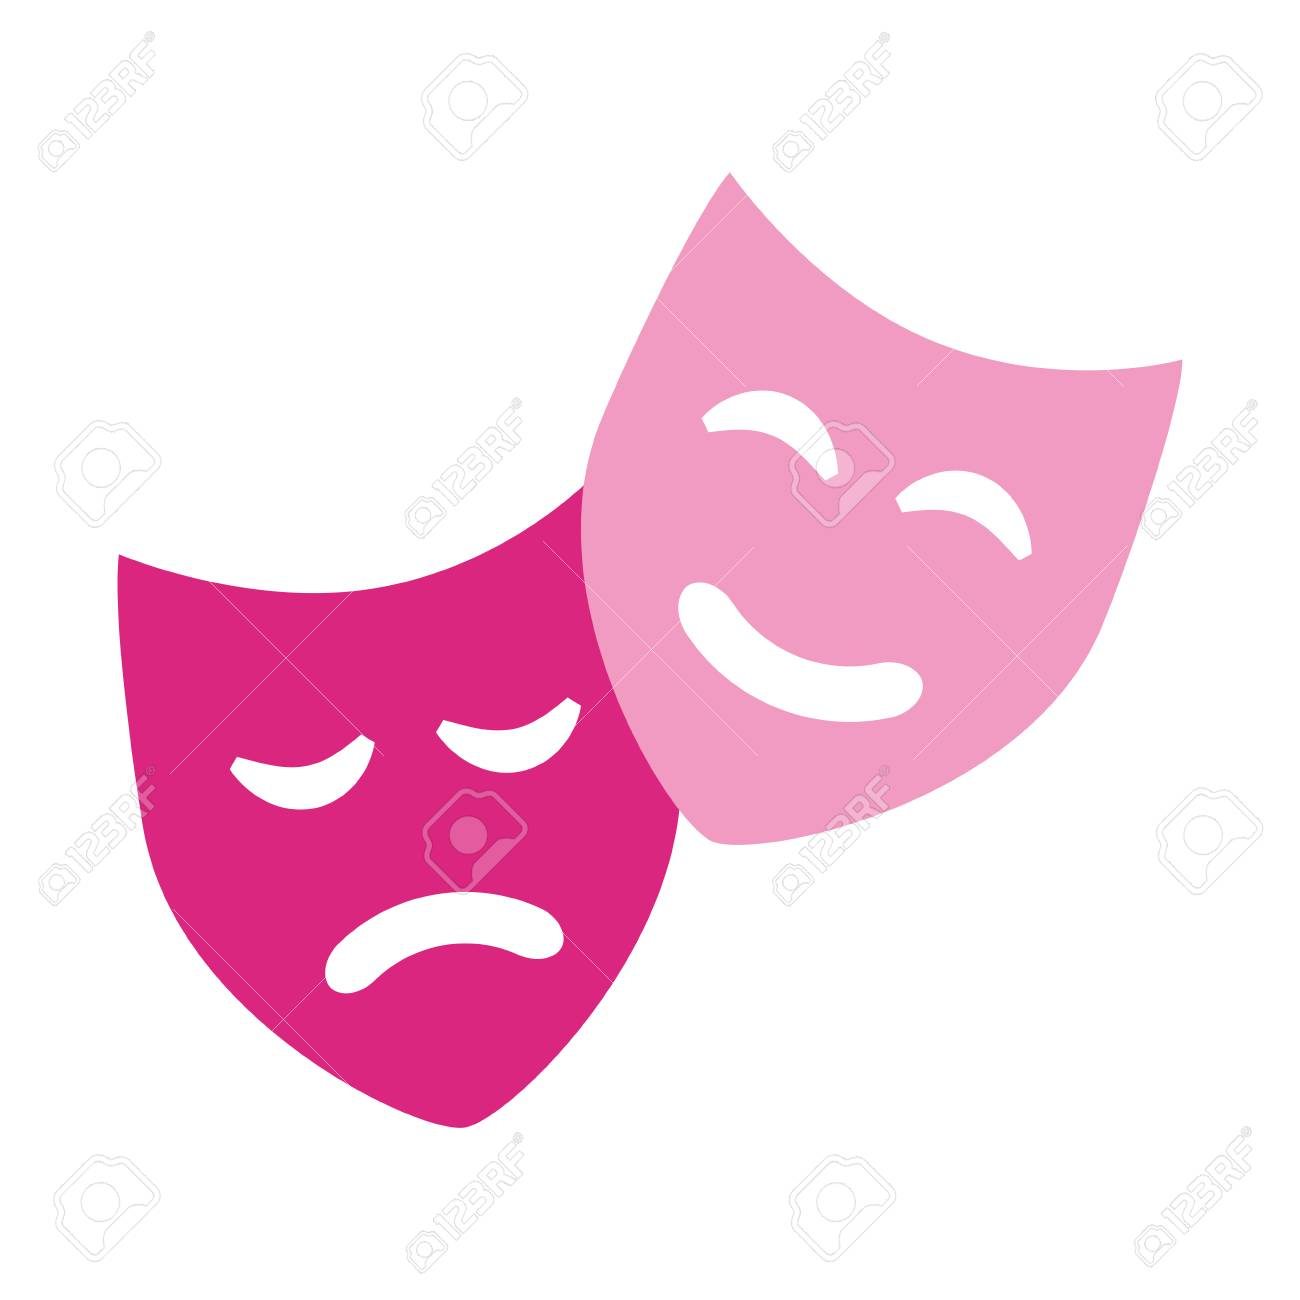 comedy drama masks theater symbol vector illustration - 109939978